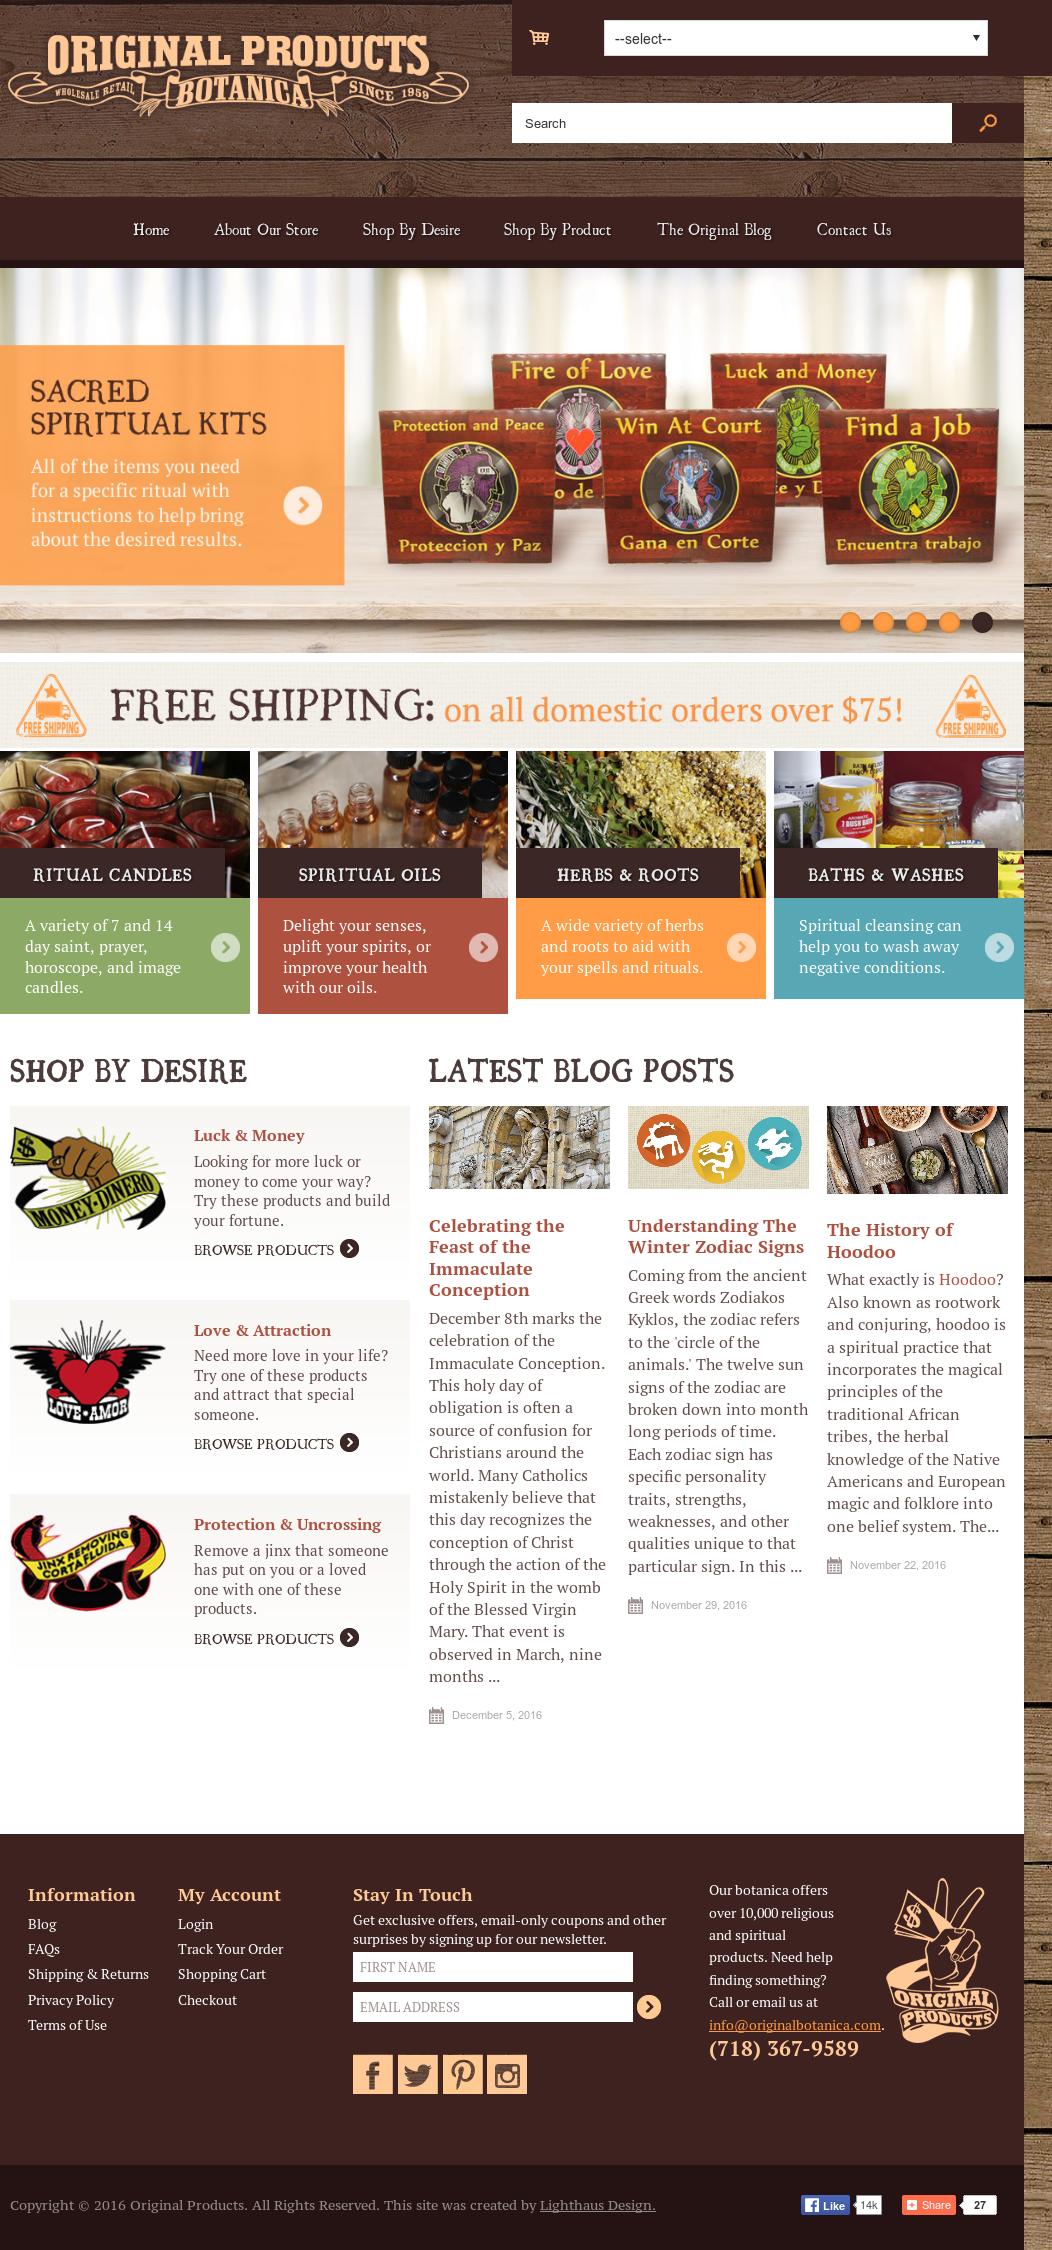 Owler Reports - Original Products Blog Meet Alex Inle